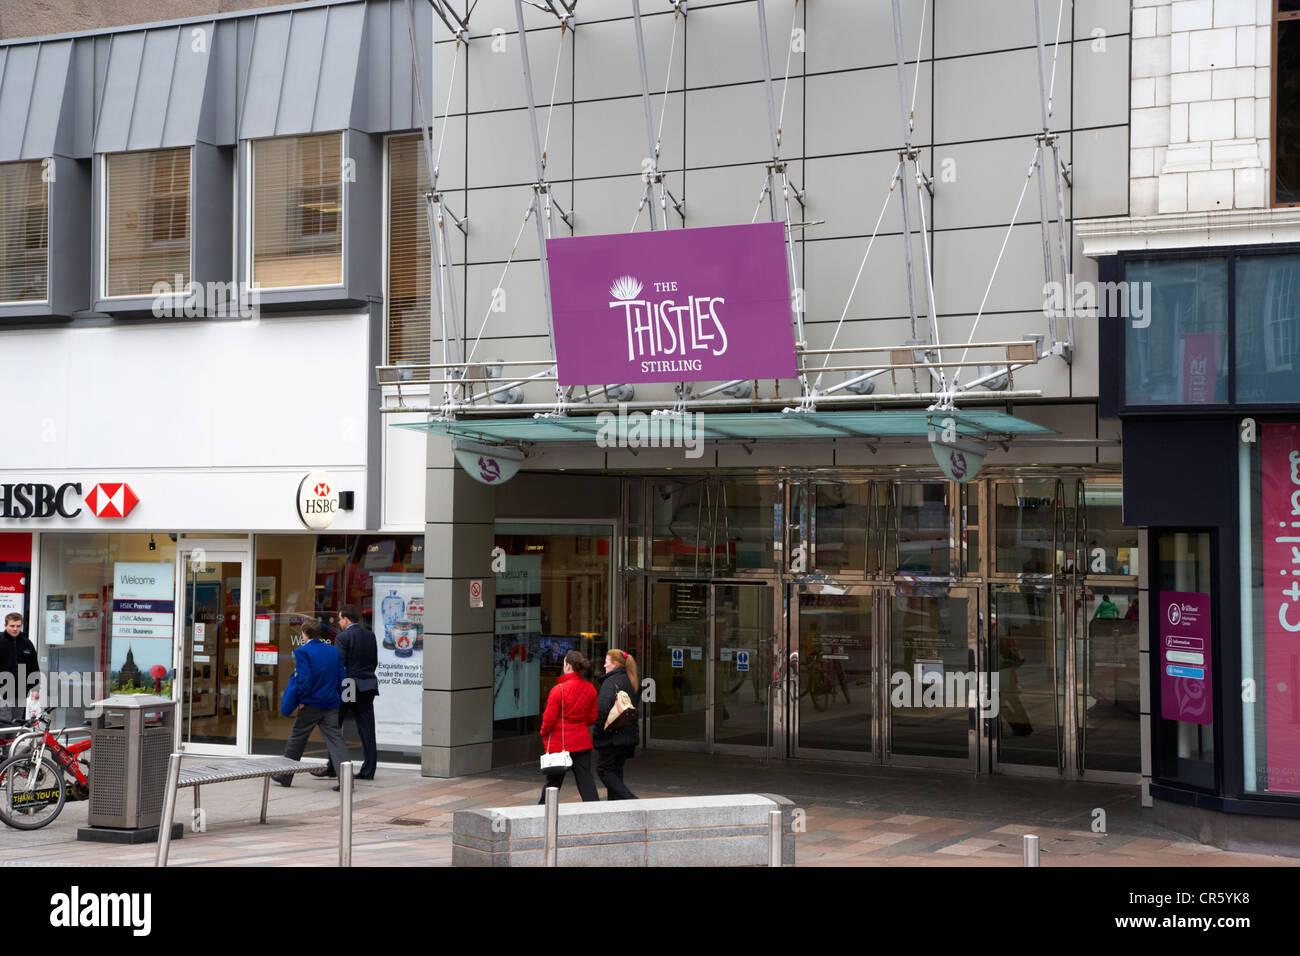 the thistles shopping centre stirling scotland uk - Stock Image